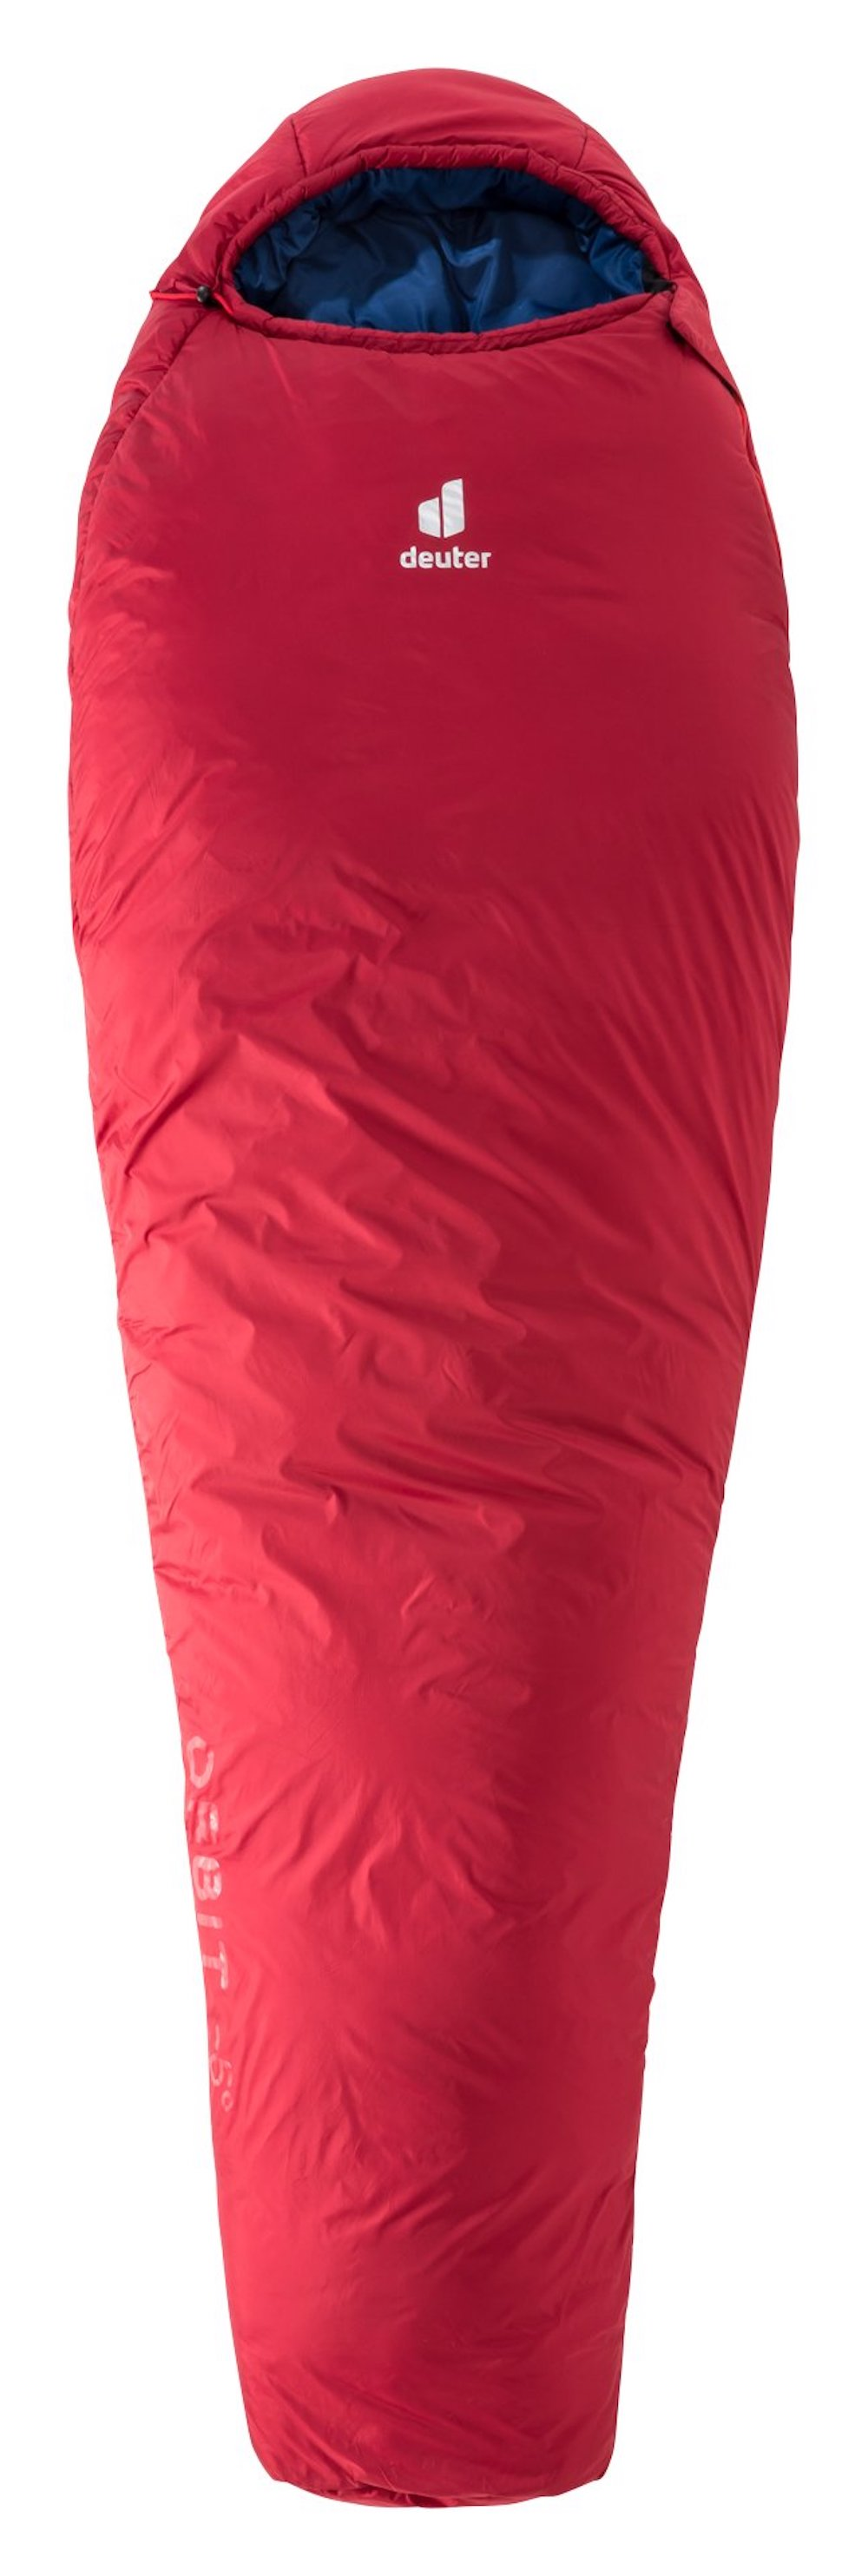 Deuter - Orbit -5° / Zip left, Kunstfaserschlafsäcke